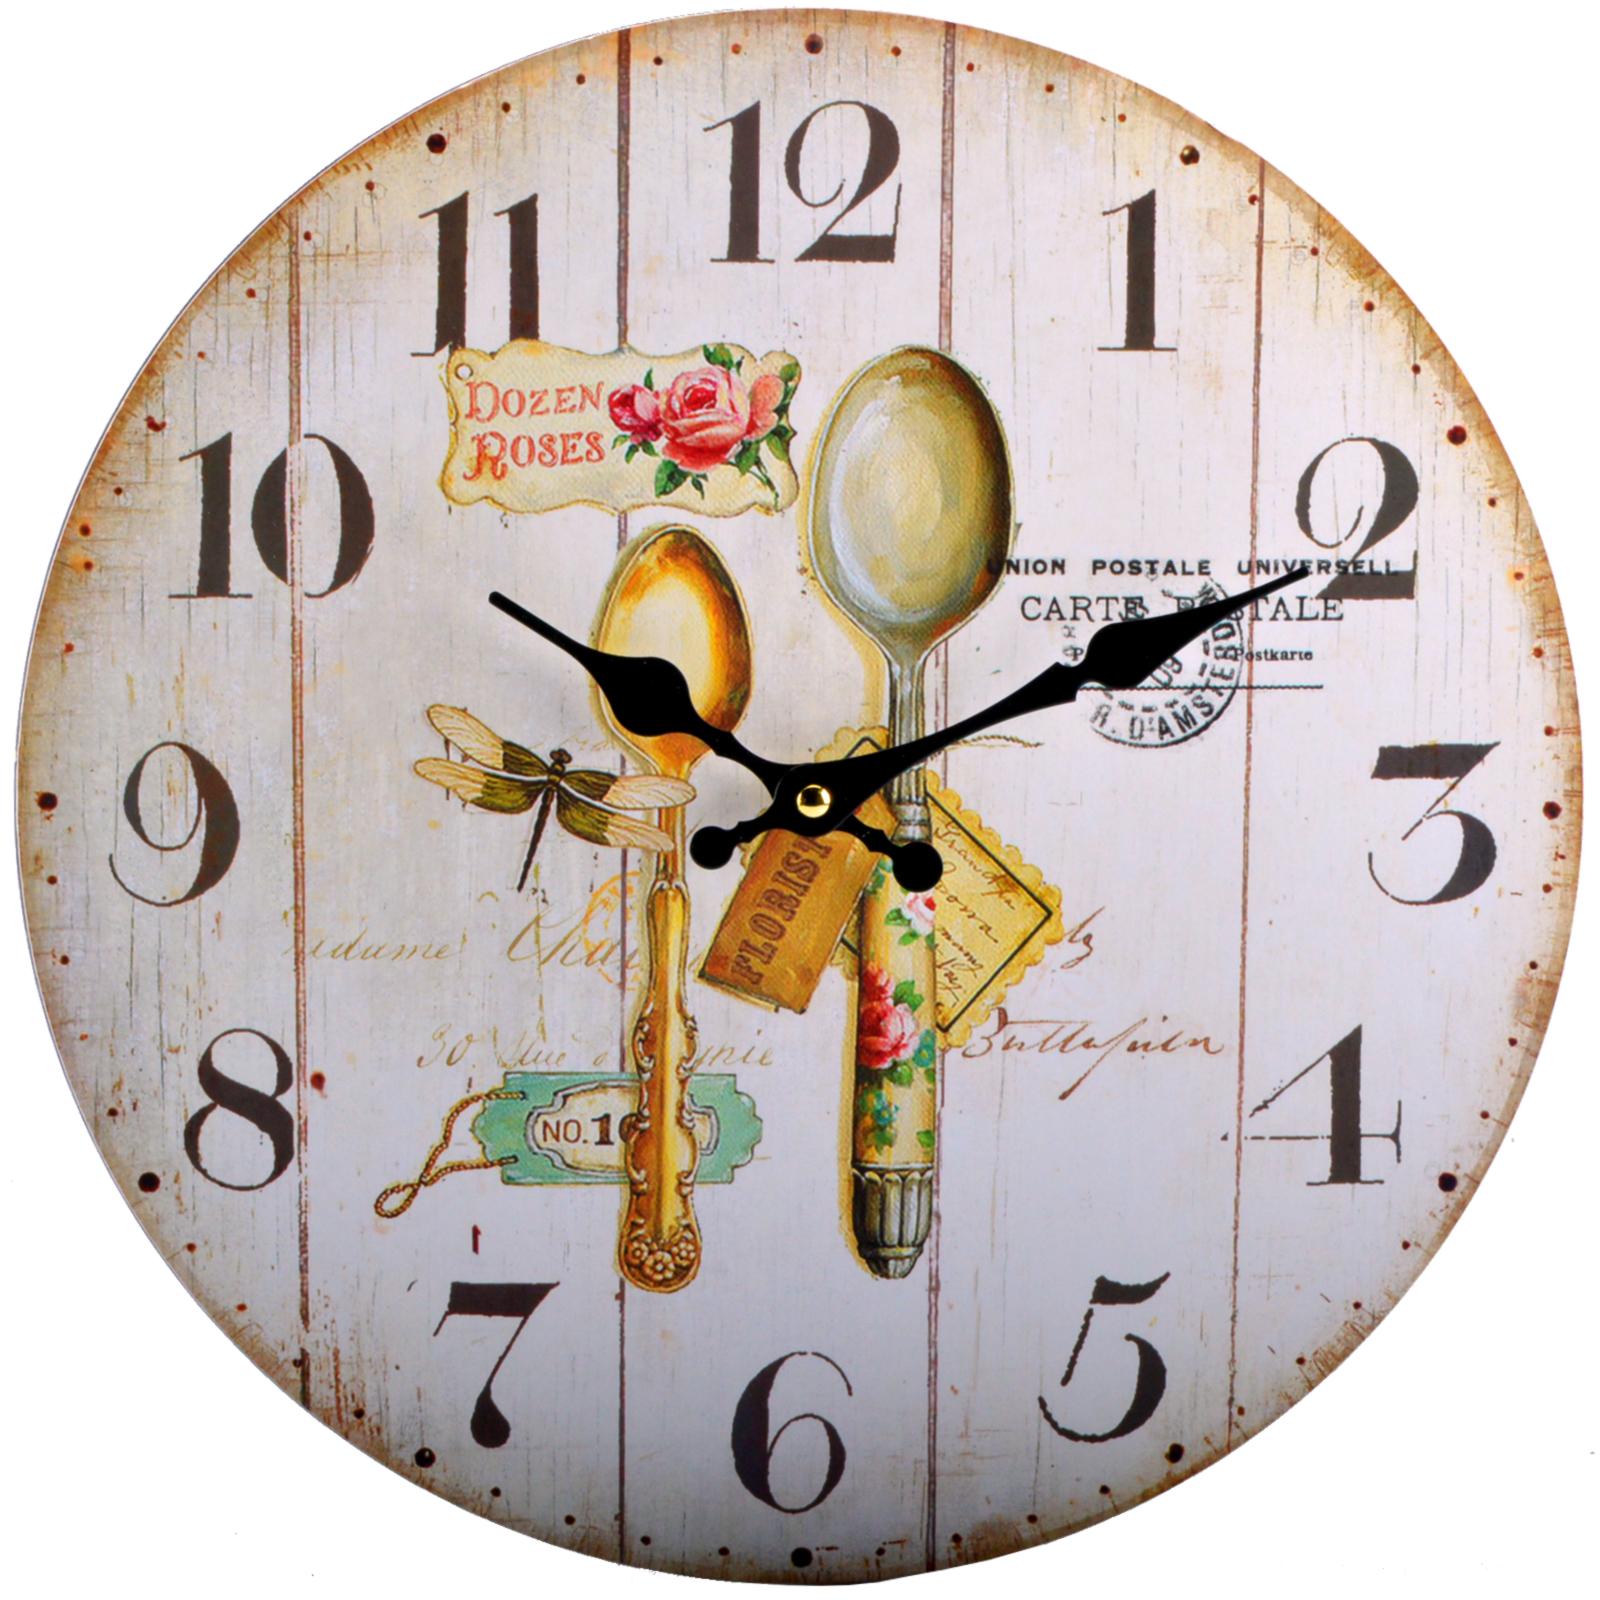 12 modelo relojes de pared casa campo madera cocina horas for Relojes de cocina modernos